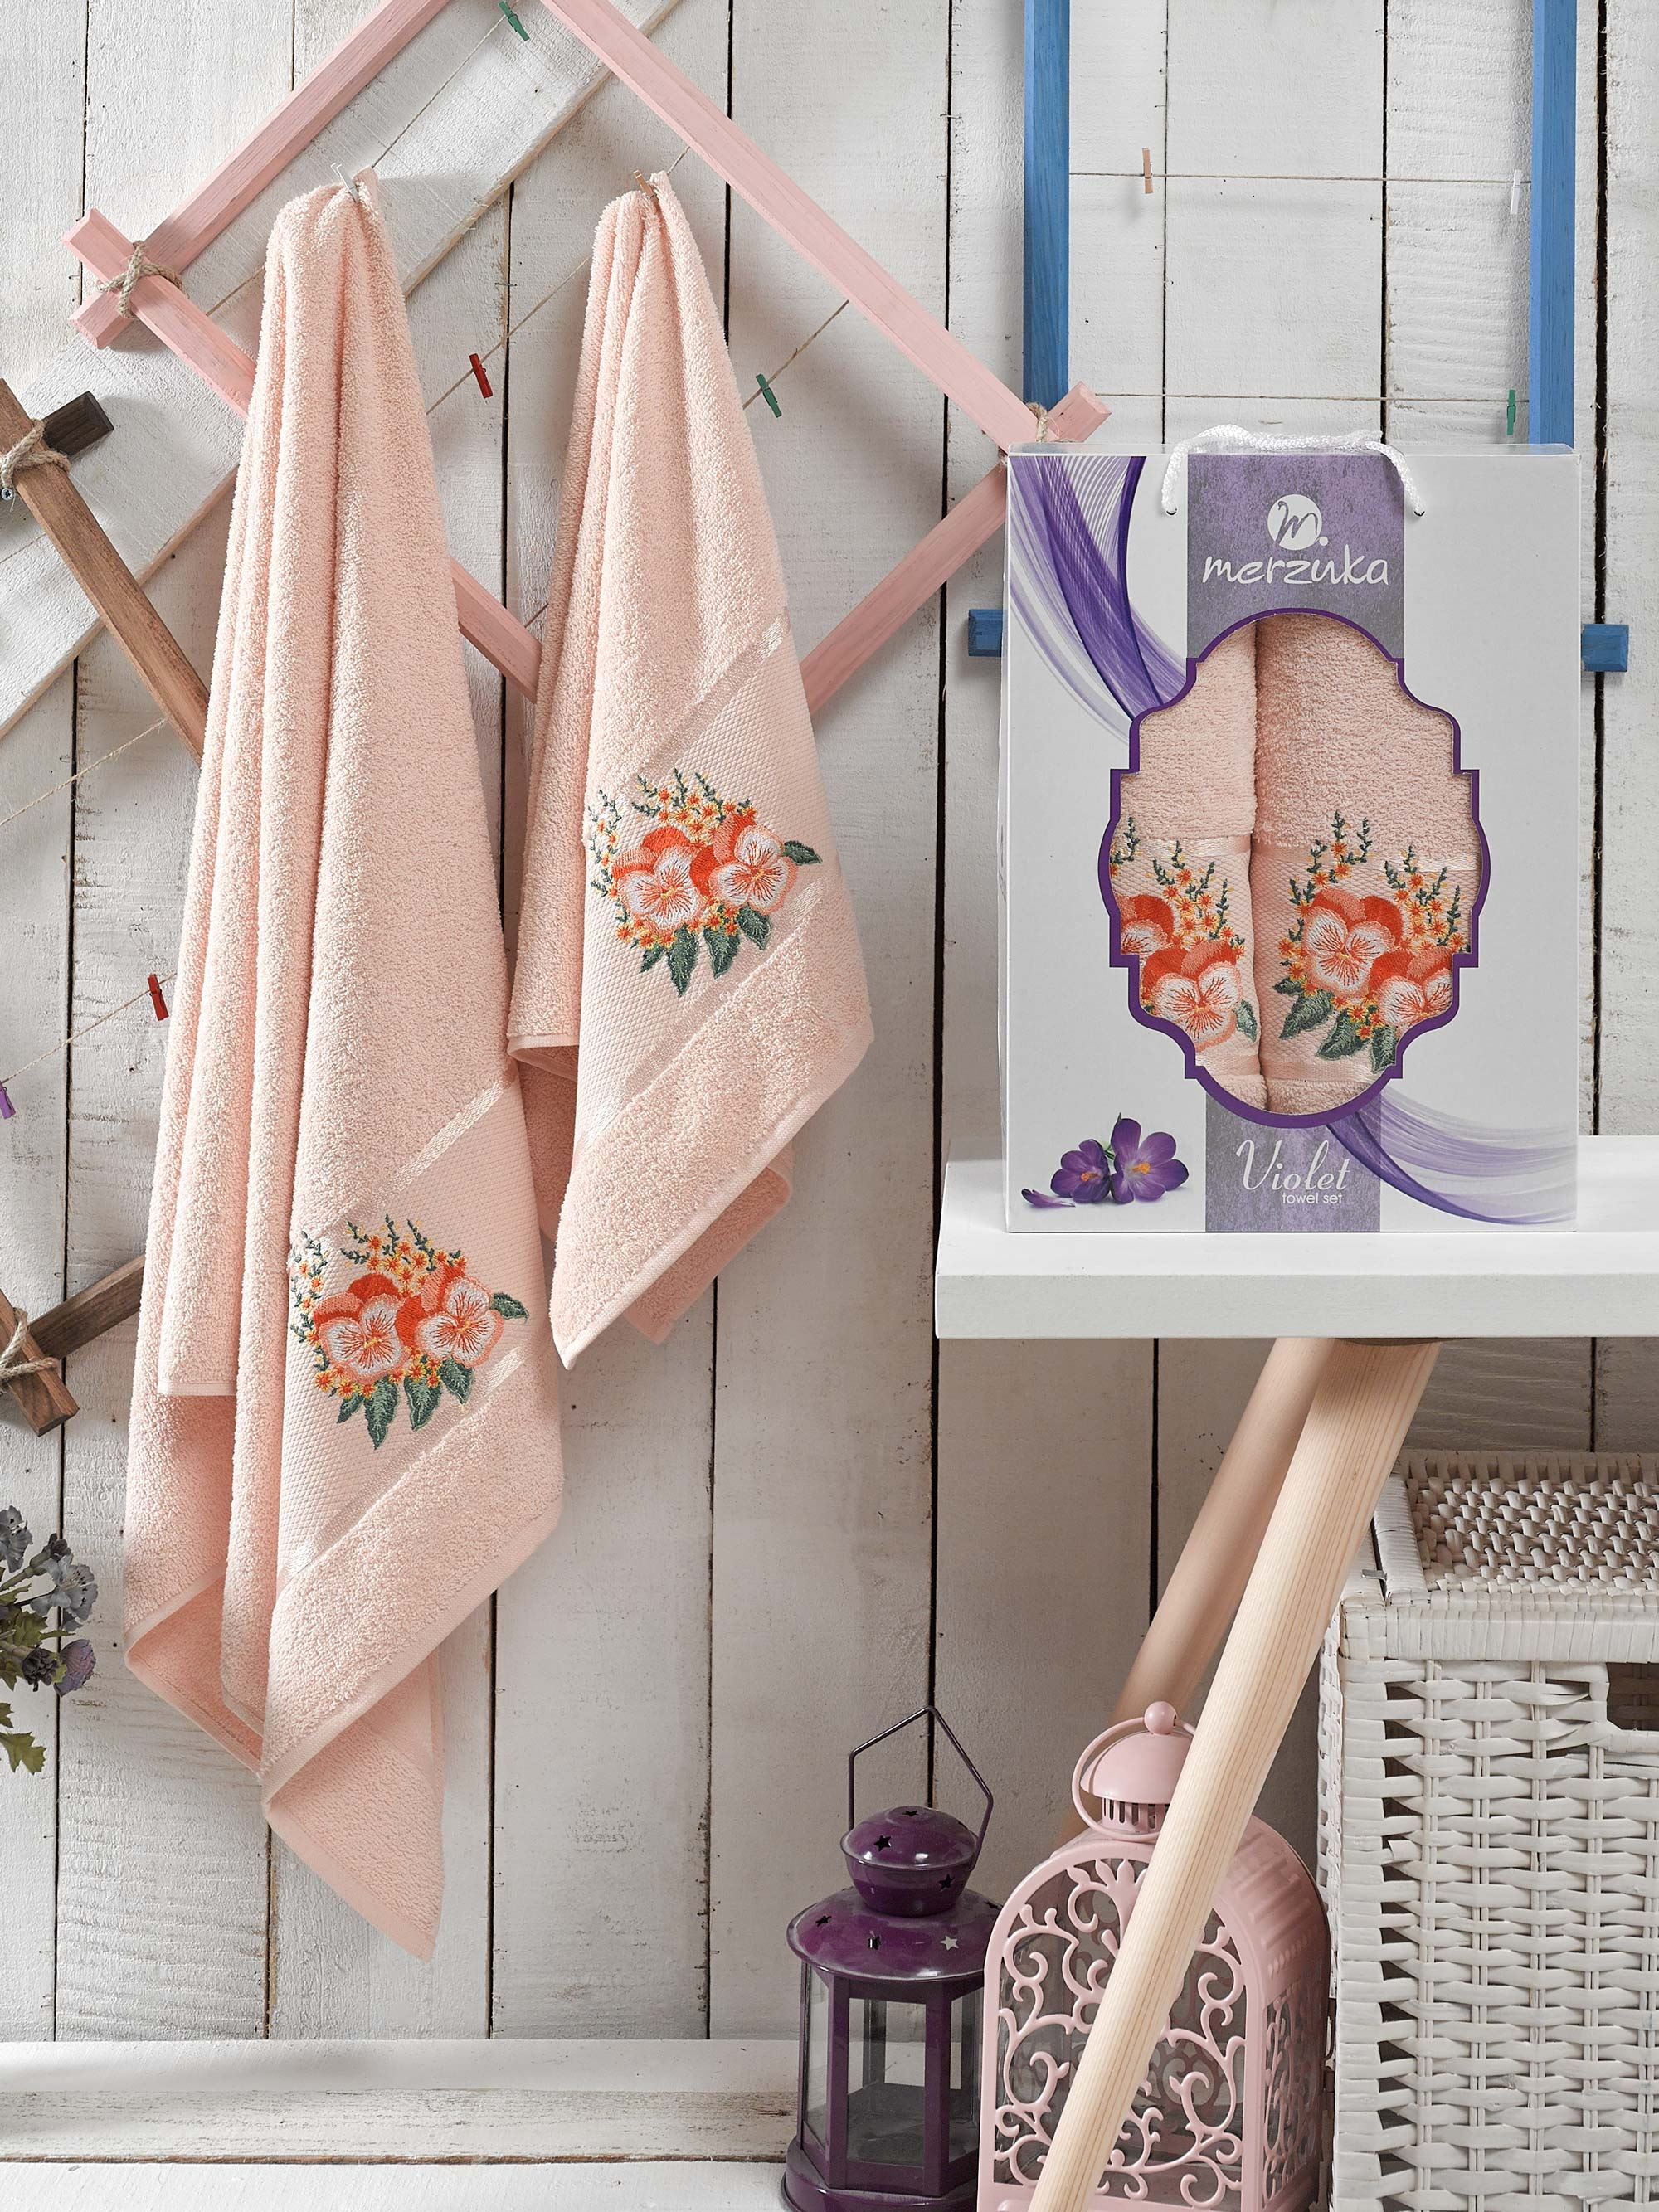 Полотенца Oran Merzuka Полотенце Violet Цвет: Пудра (50х80 см,70х130 см) набор из 3 полотенец merzuka sakura 50х90 2 70х140 8432 оранжевый